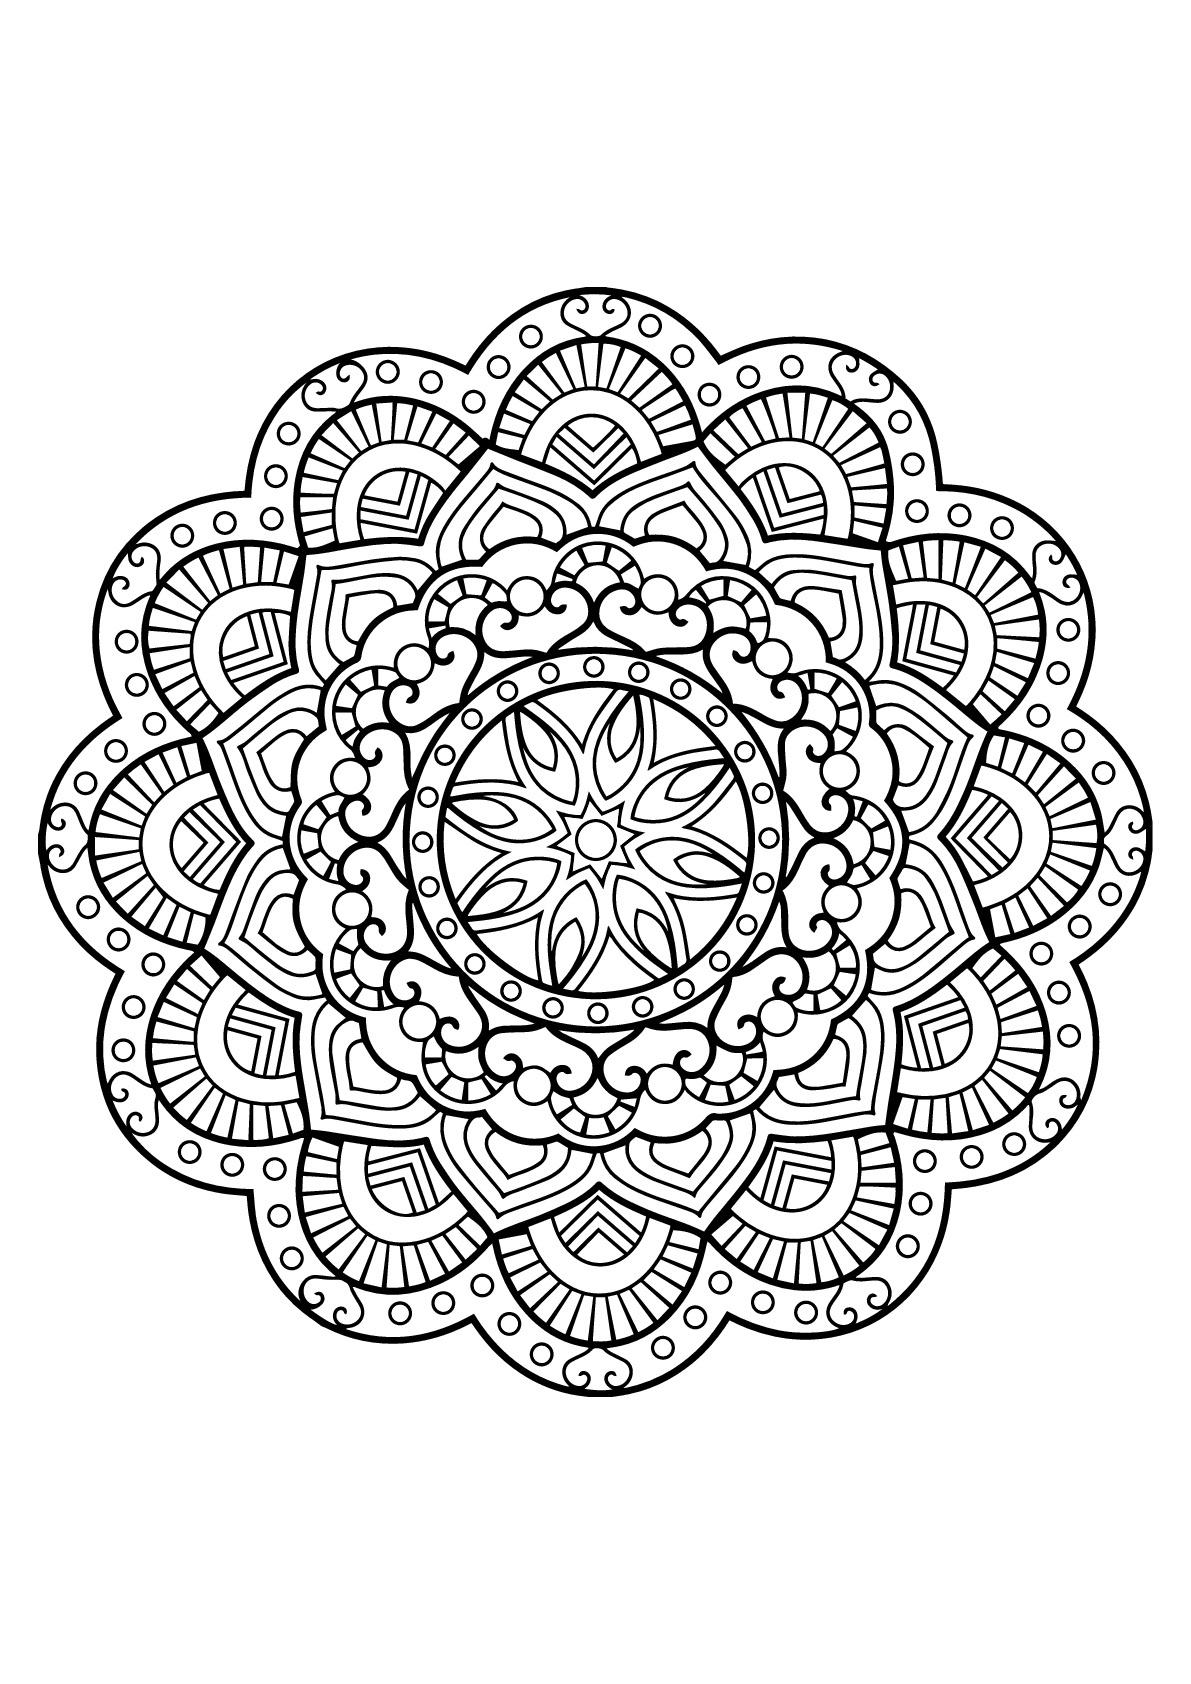 Mandala From Free Coloring Books For Adults 26 - M&alas Adult - Free Printable Mandalas